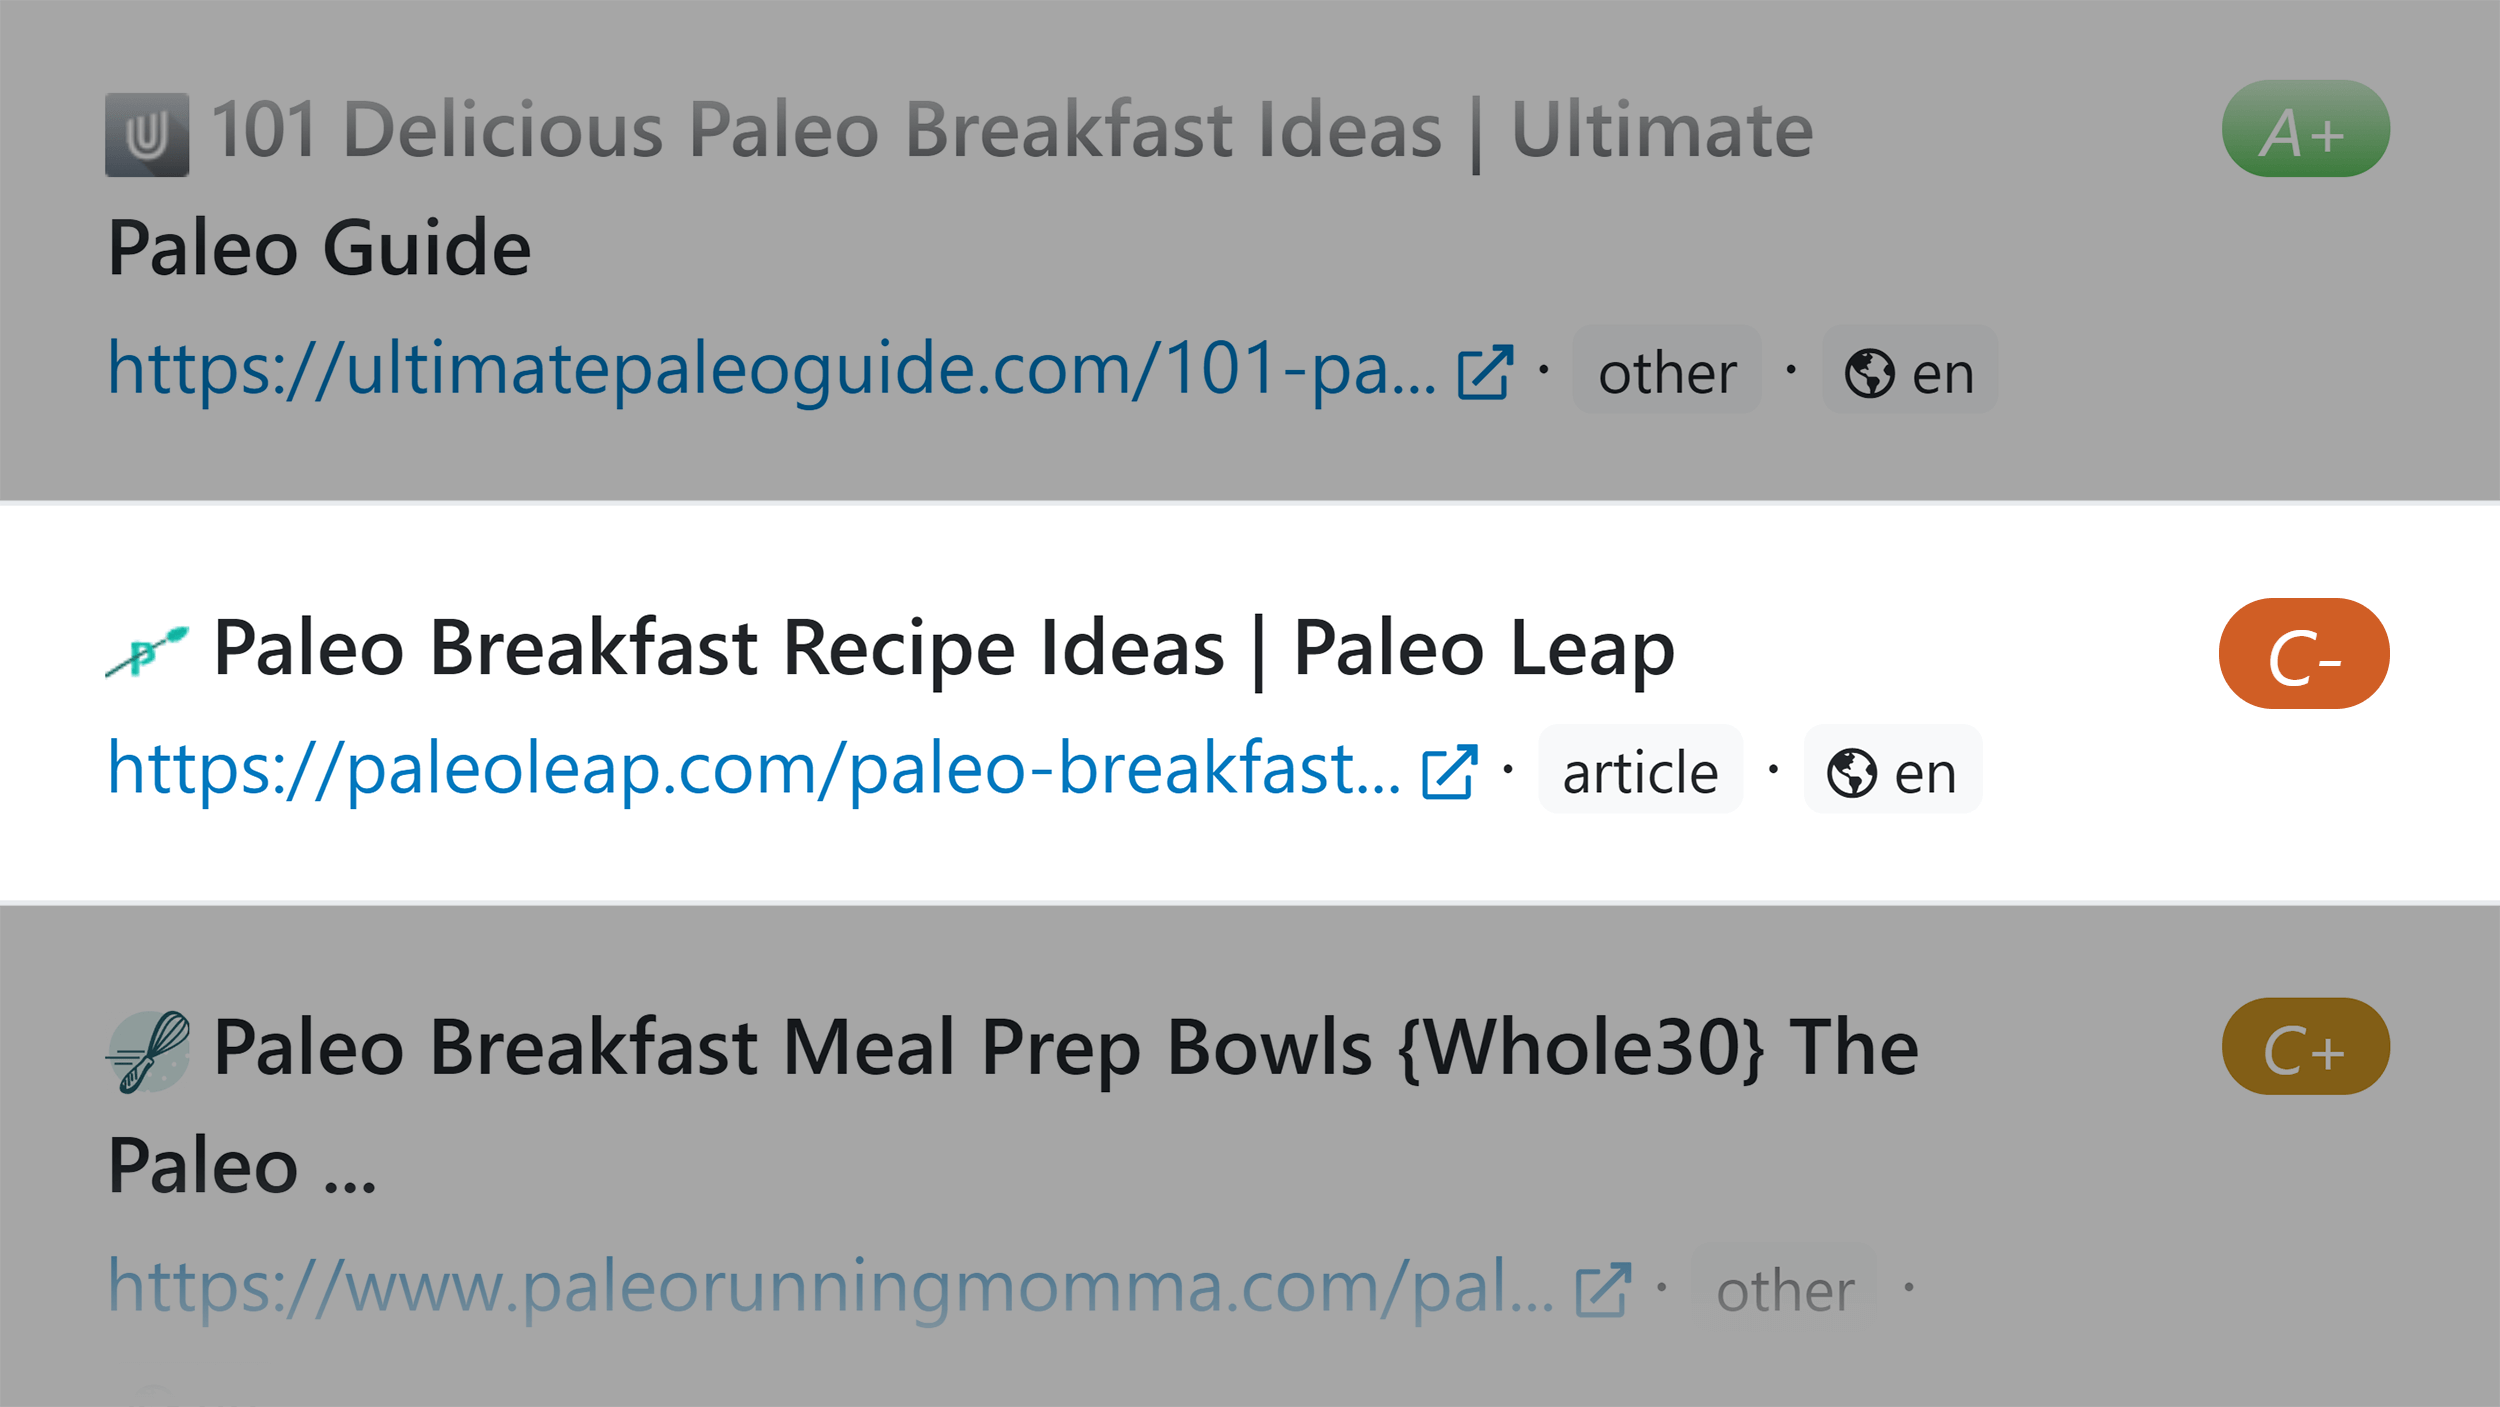 Paleo breakfast ideas – Content grade